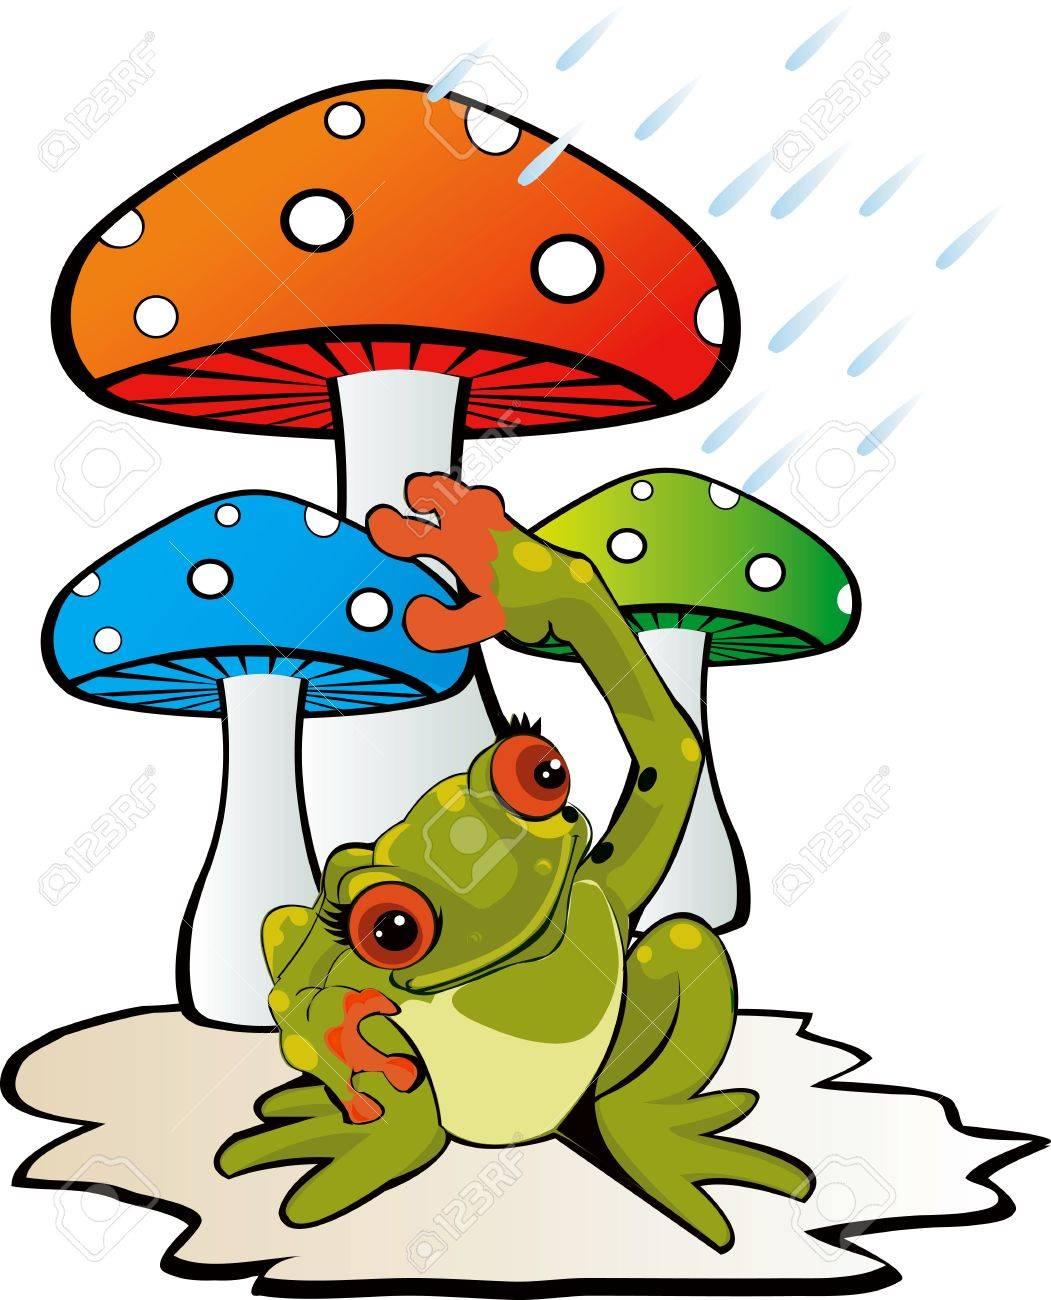 Illustration of mushroom with a toad Stock Illustration - 3008649